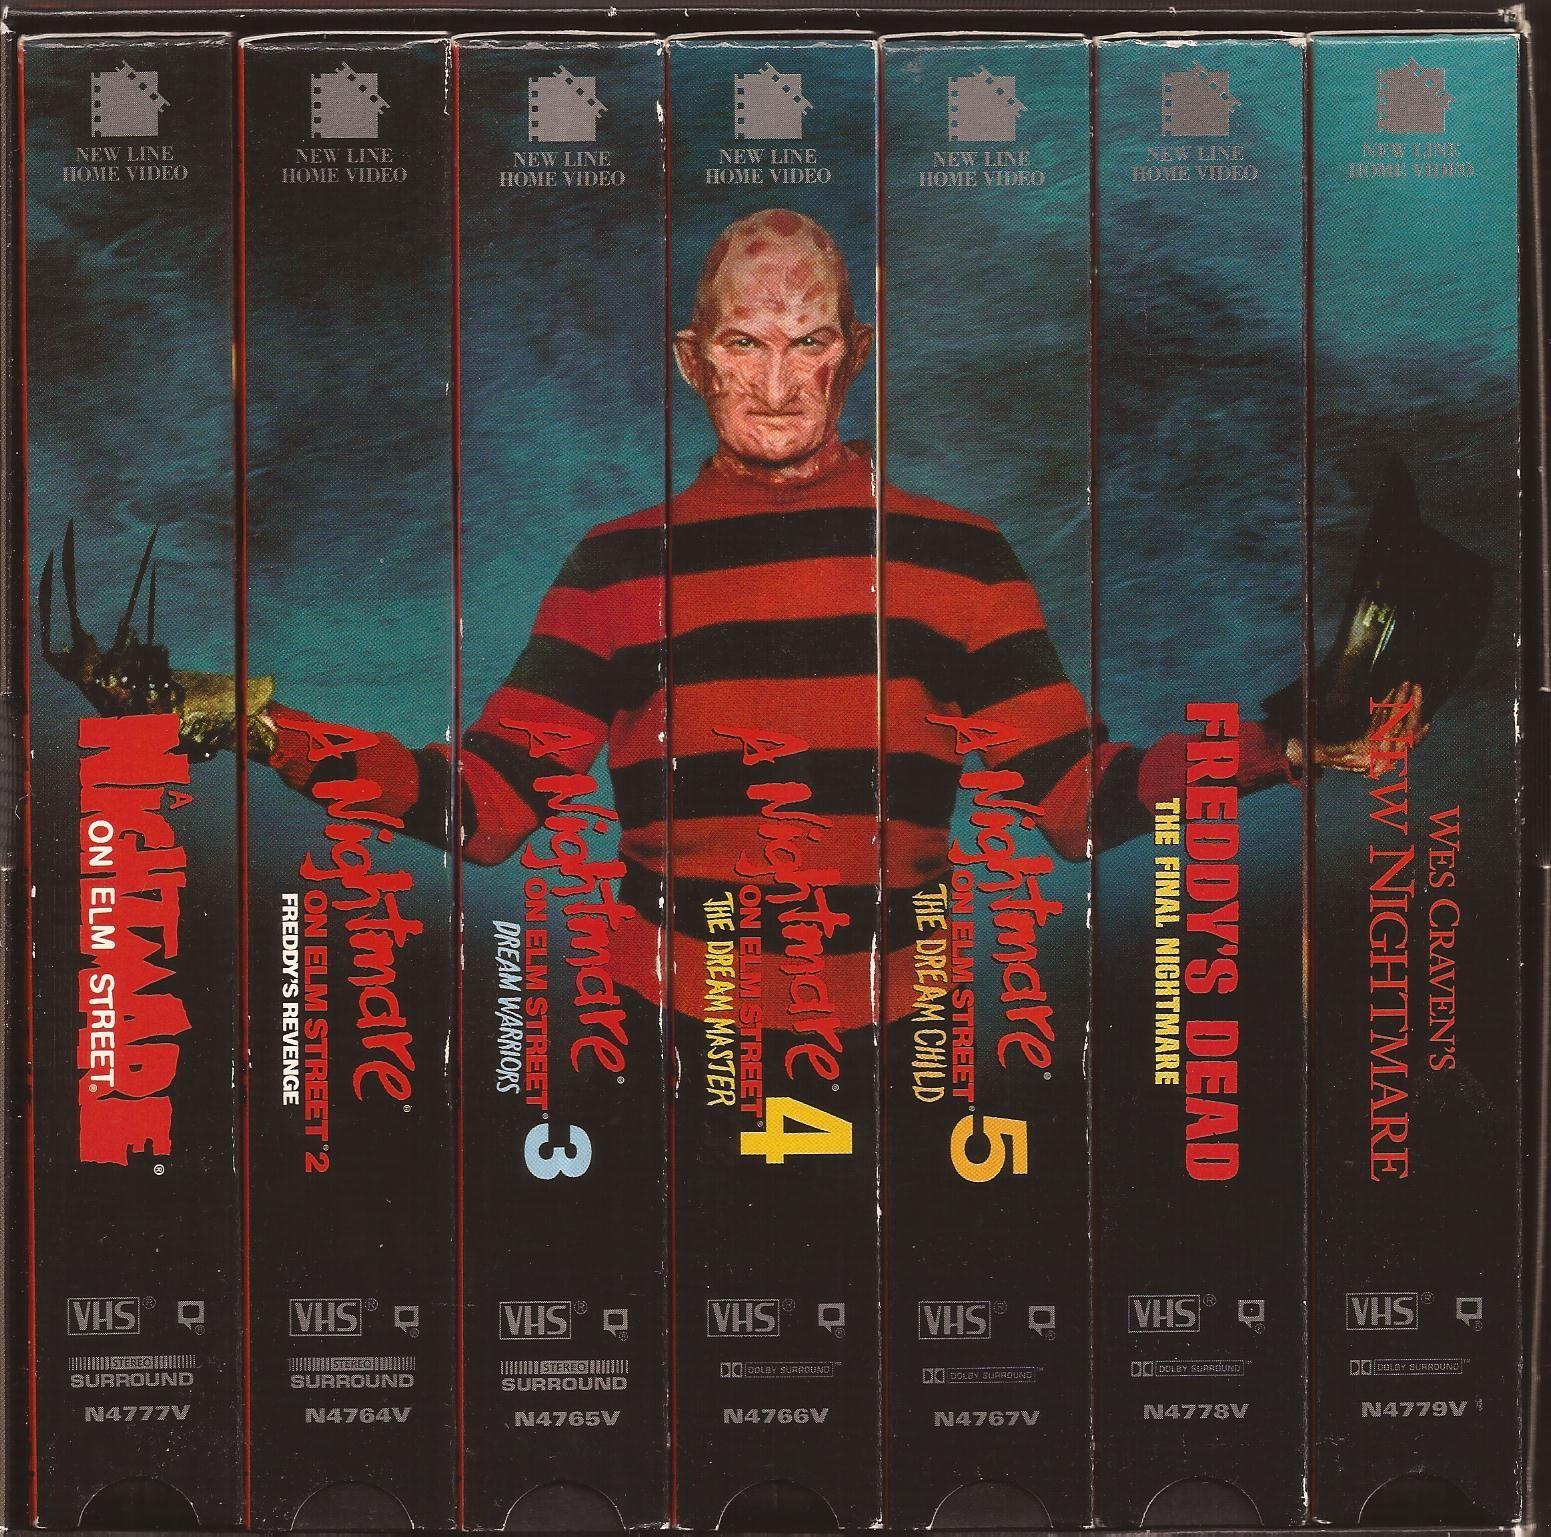 Halloween Dvd Box Set.A Nightmare On Elm Street Vhs Box Set A Nightmare On Elm Street